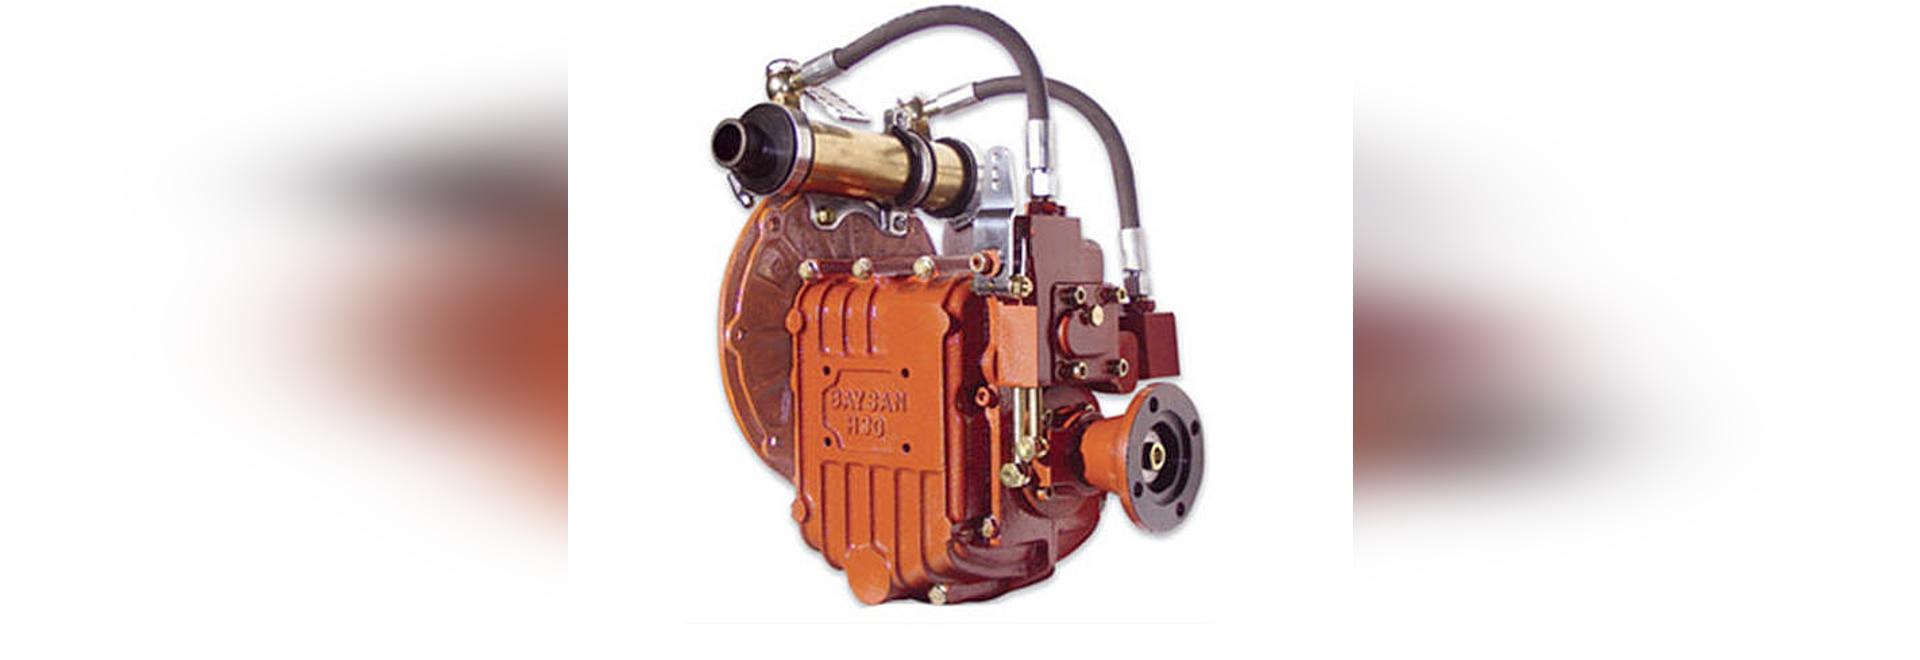 Scatola ingranaggi idraulica marina H80 di Baysan